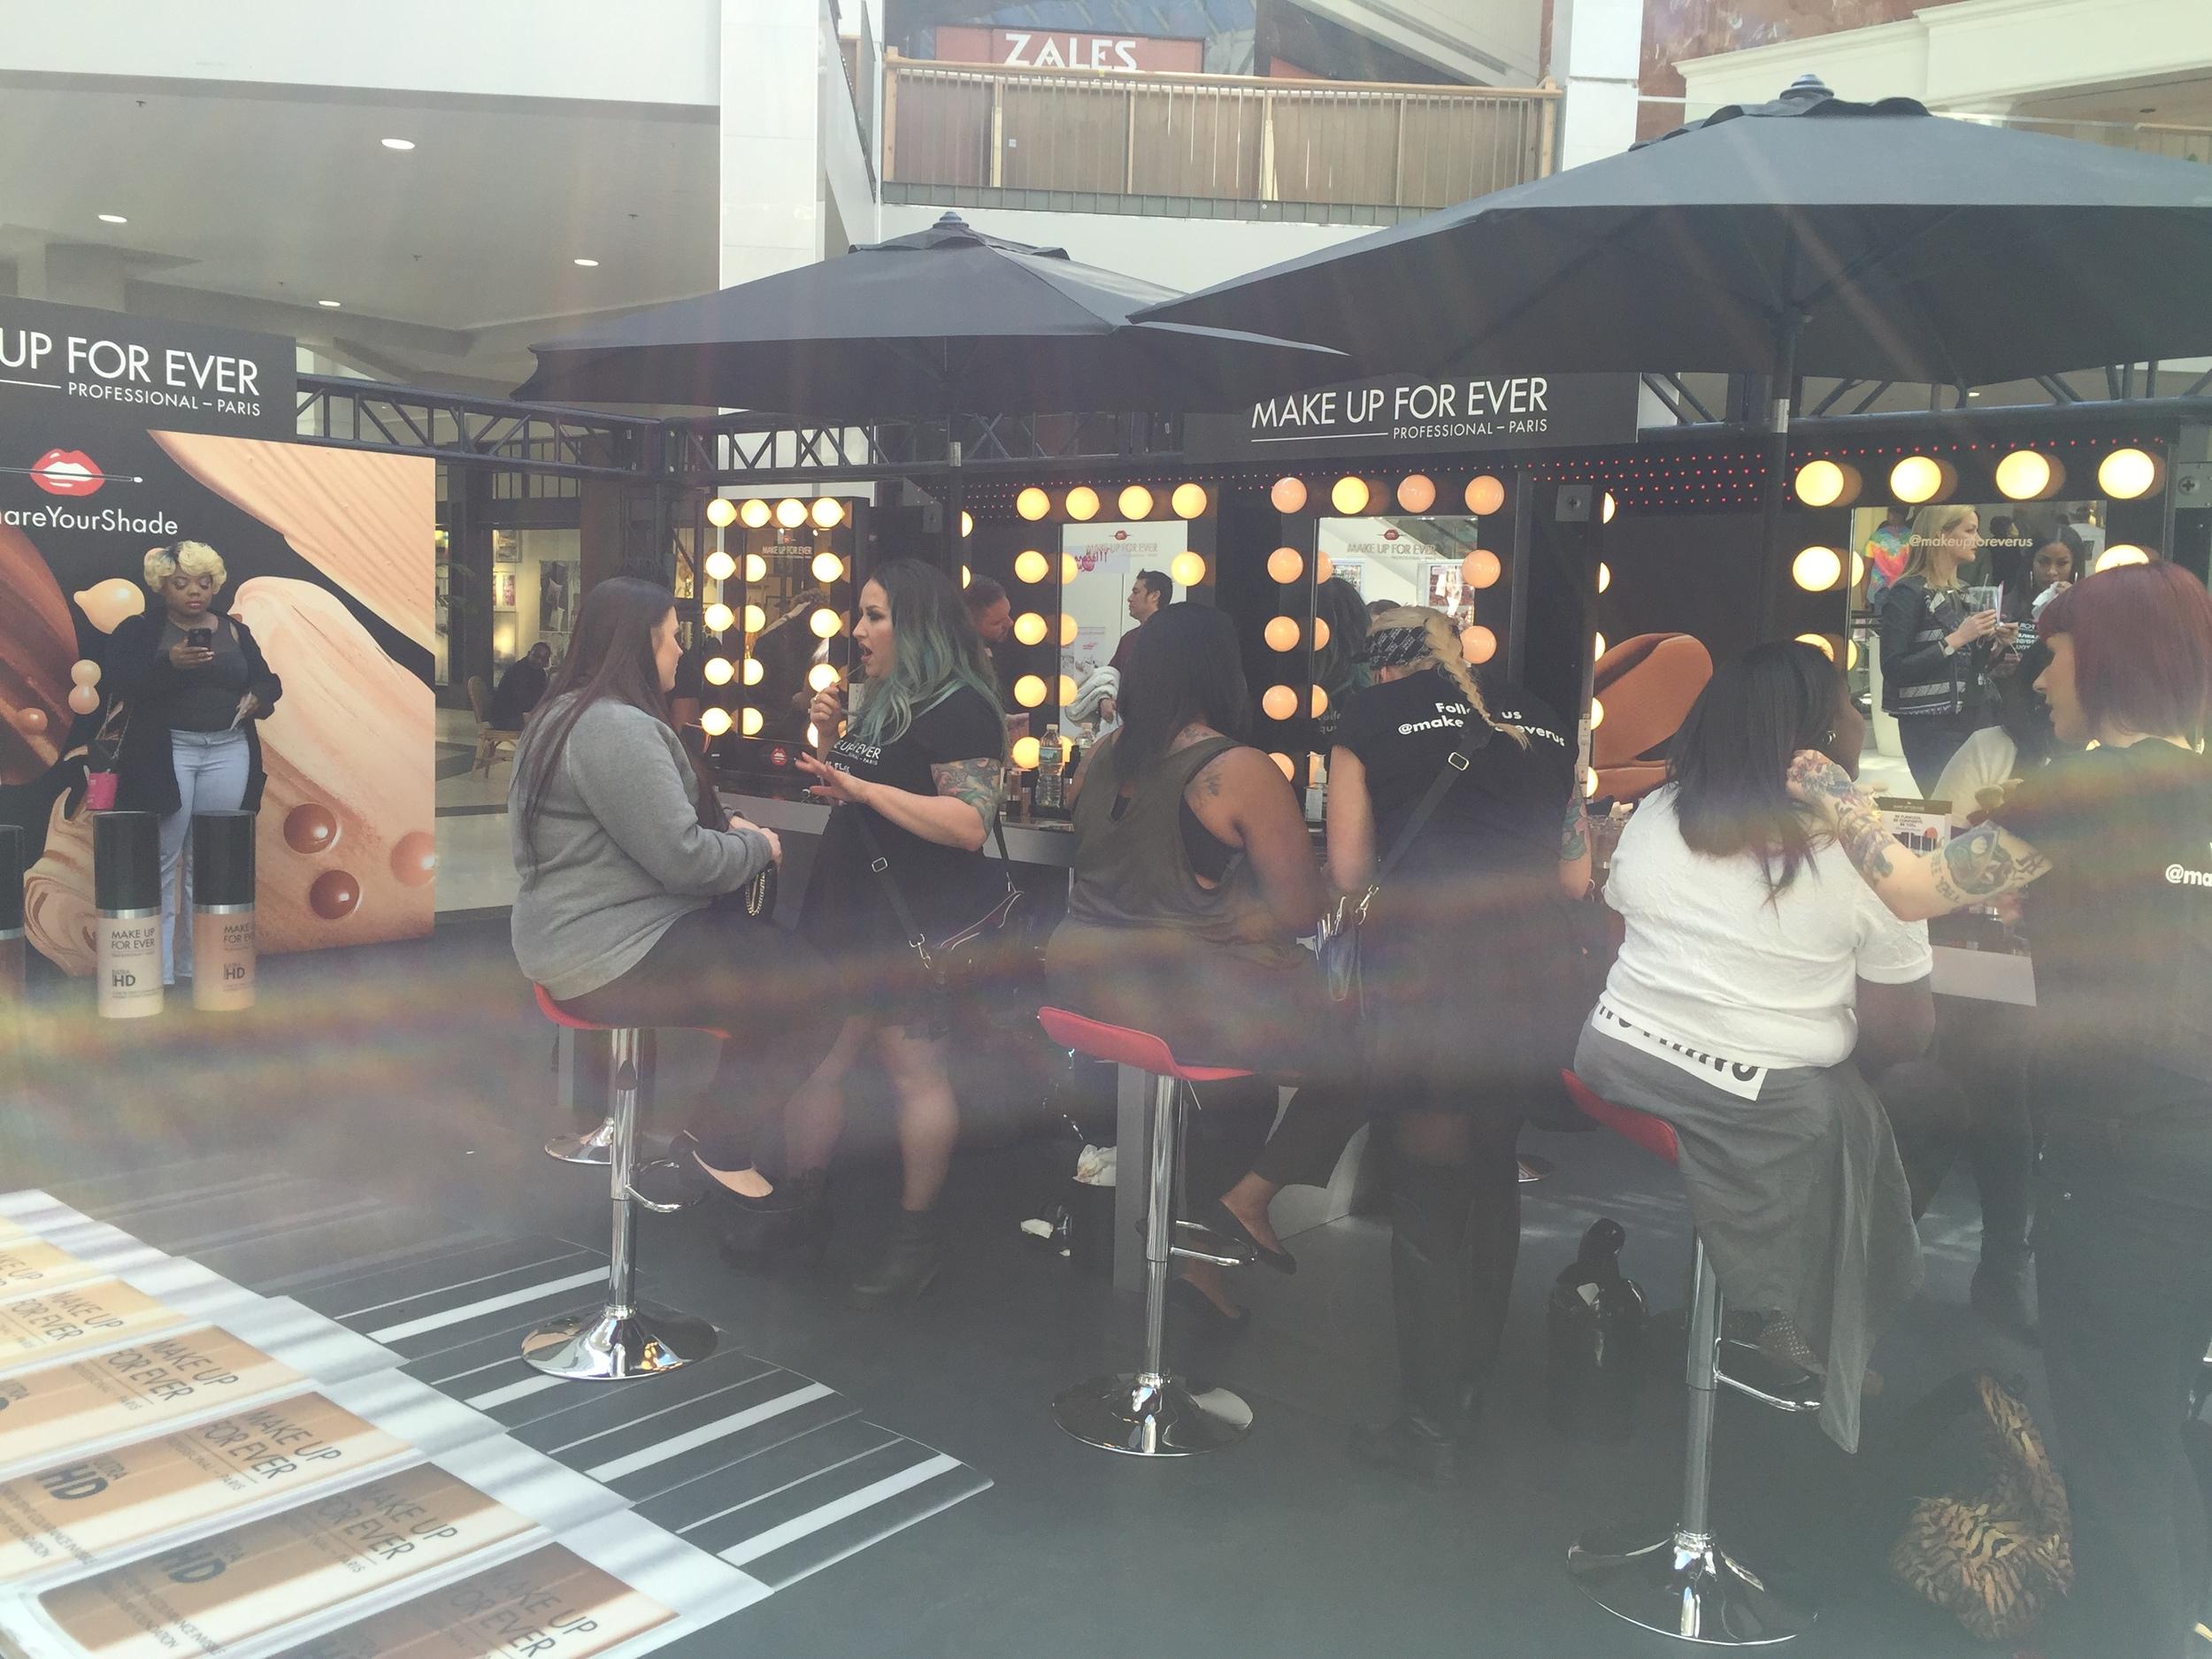 Make Up For Ever's #ShareYourShade Mega Event at Perimeter Mall, Atlanta, Georgia